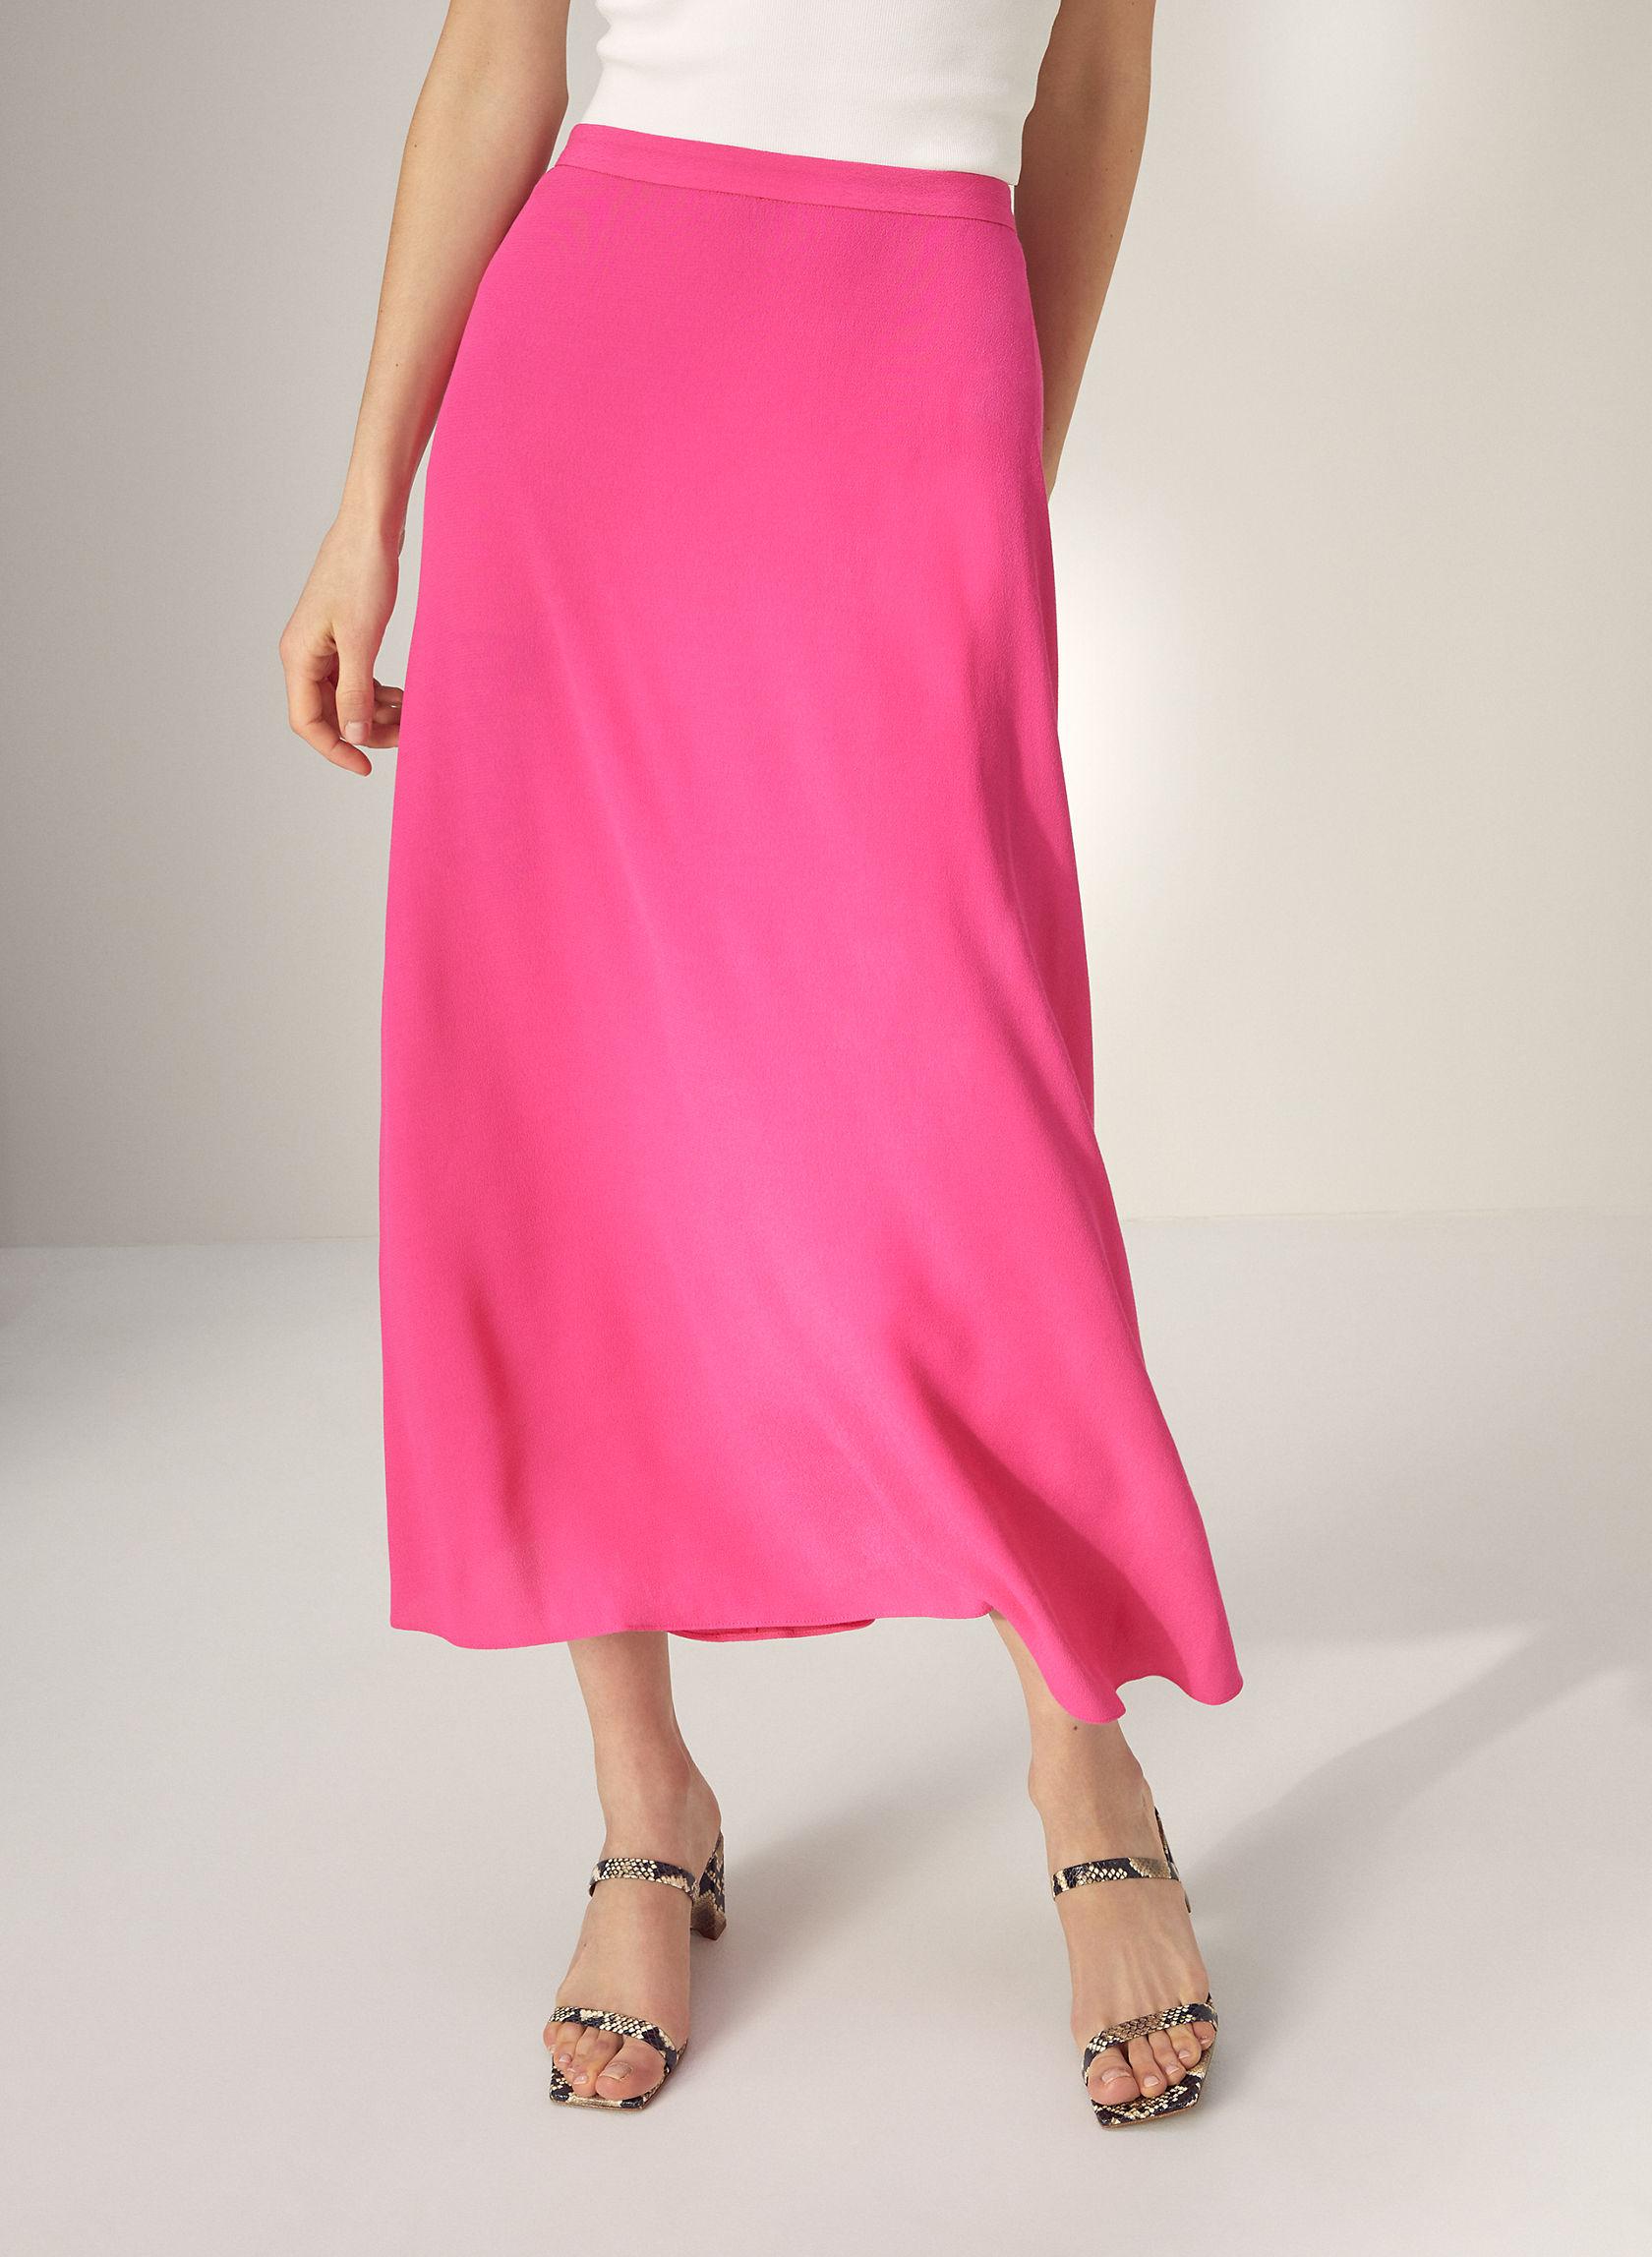 MIDI SKIRT - Slip-style midi skirt